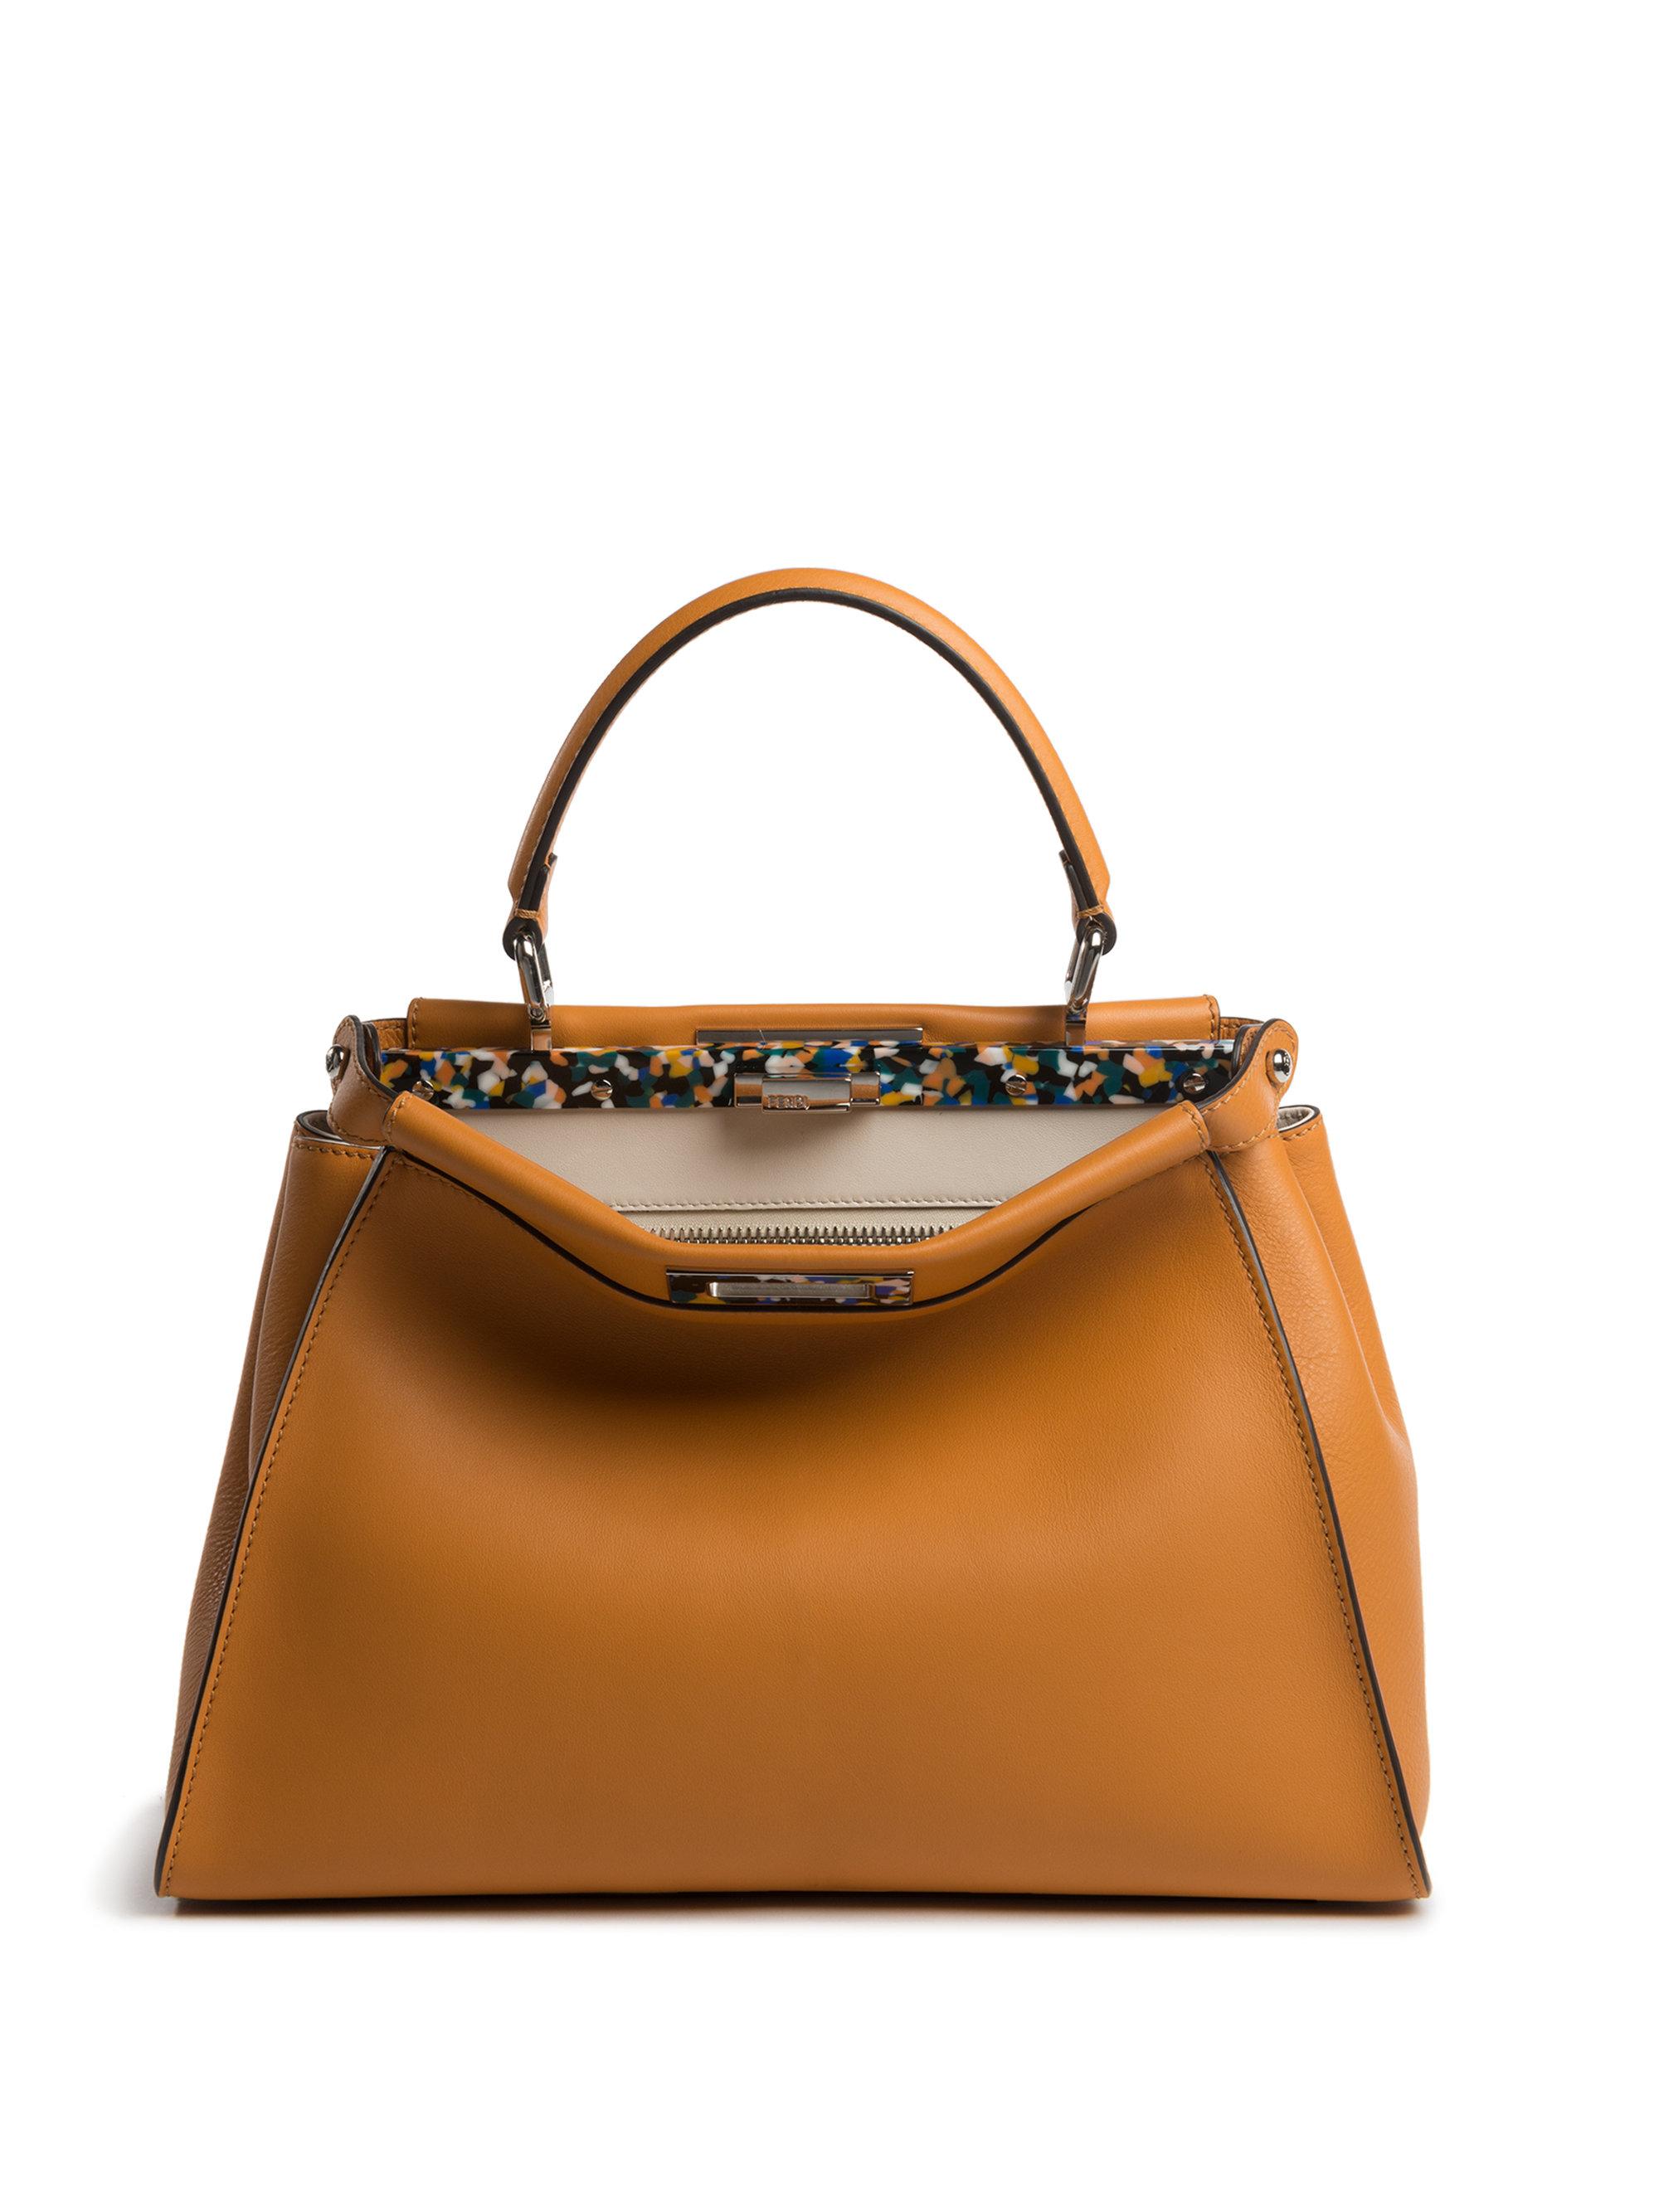 b093acb06bc0 Lyst - Fendi Peekaboo Medium Tile-accented Leather Satchel in Brown